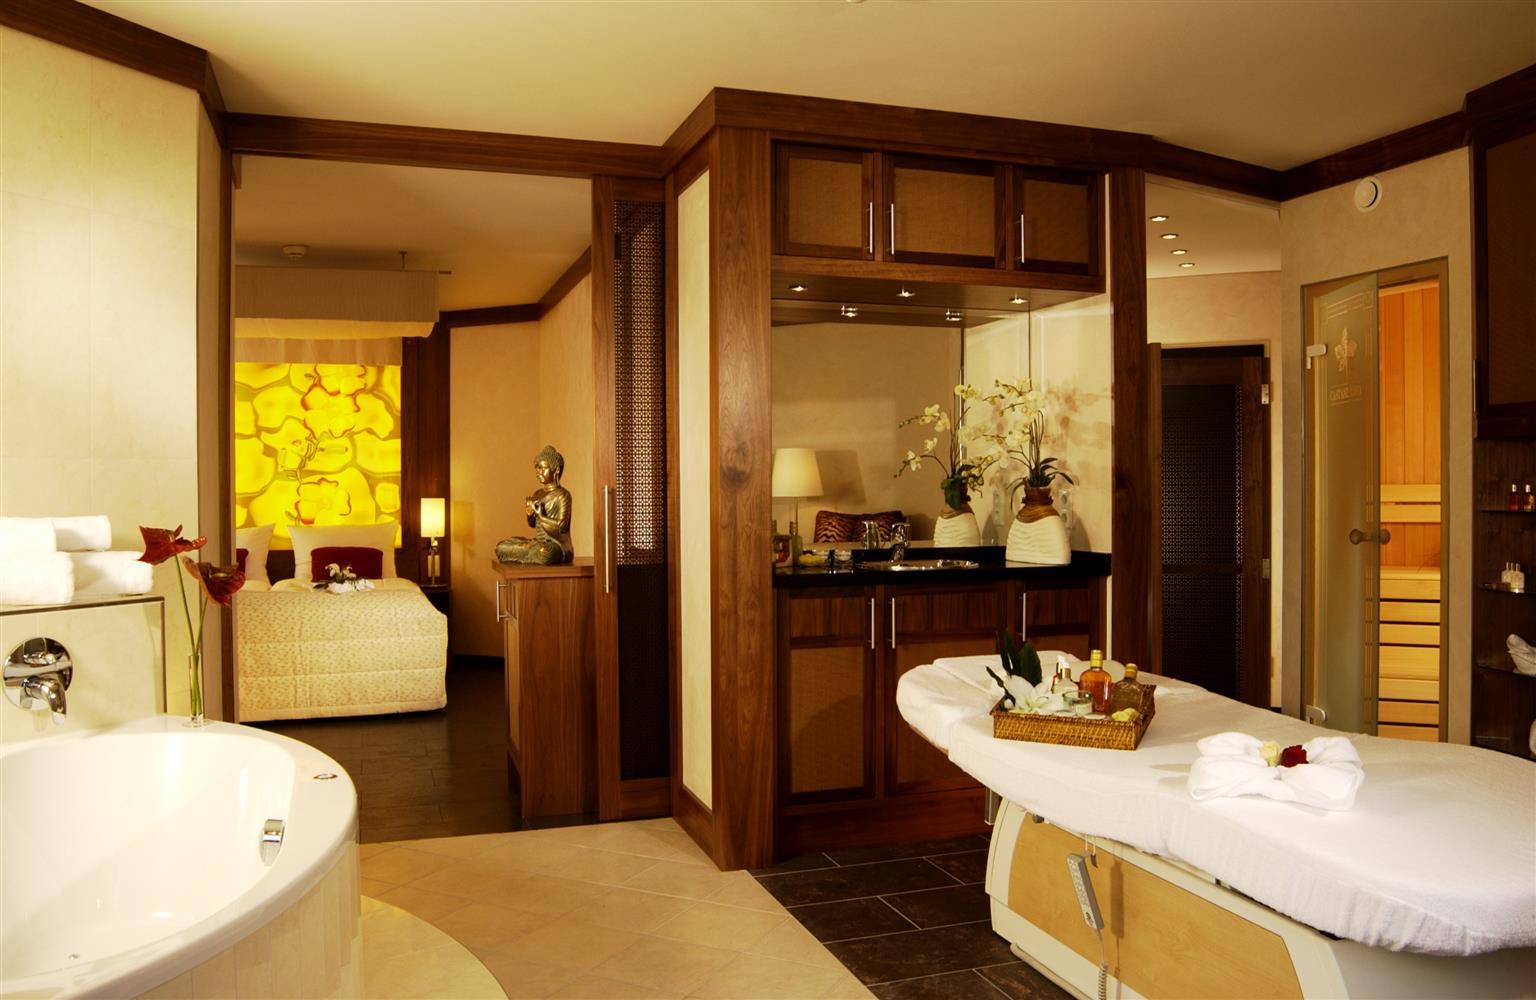 Beautiful Castanea Resort Adendorf Pictures - Thehammondreport.com ...